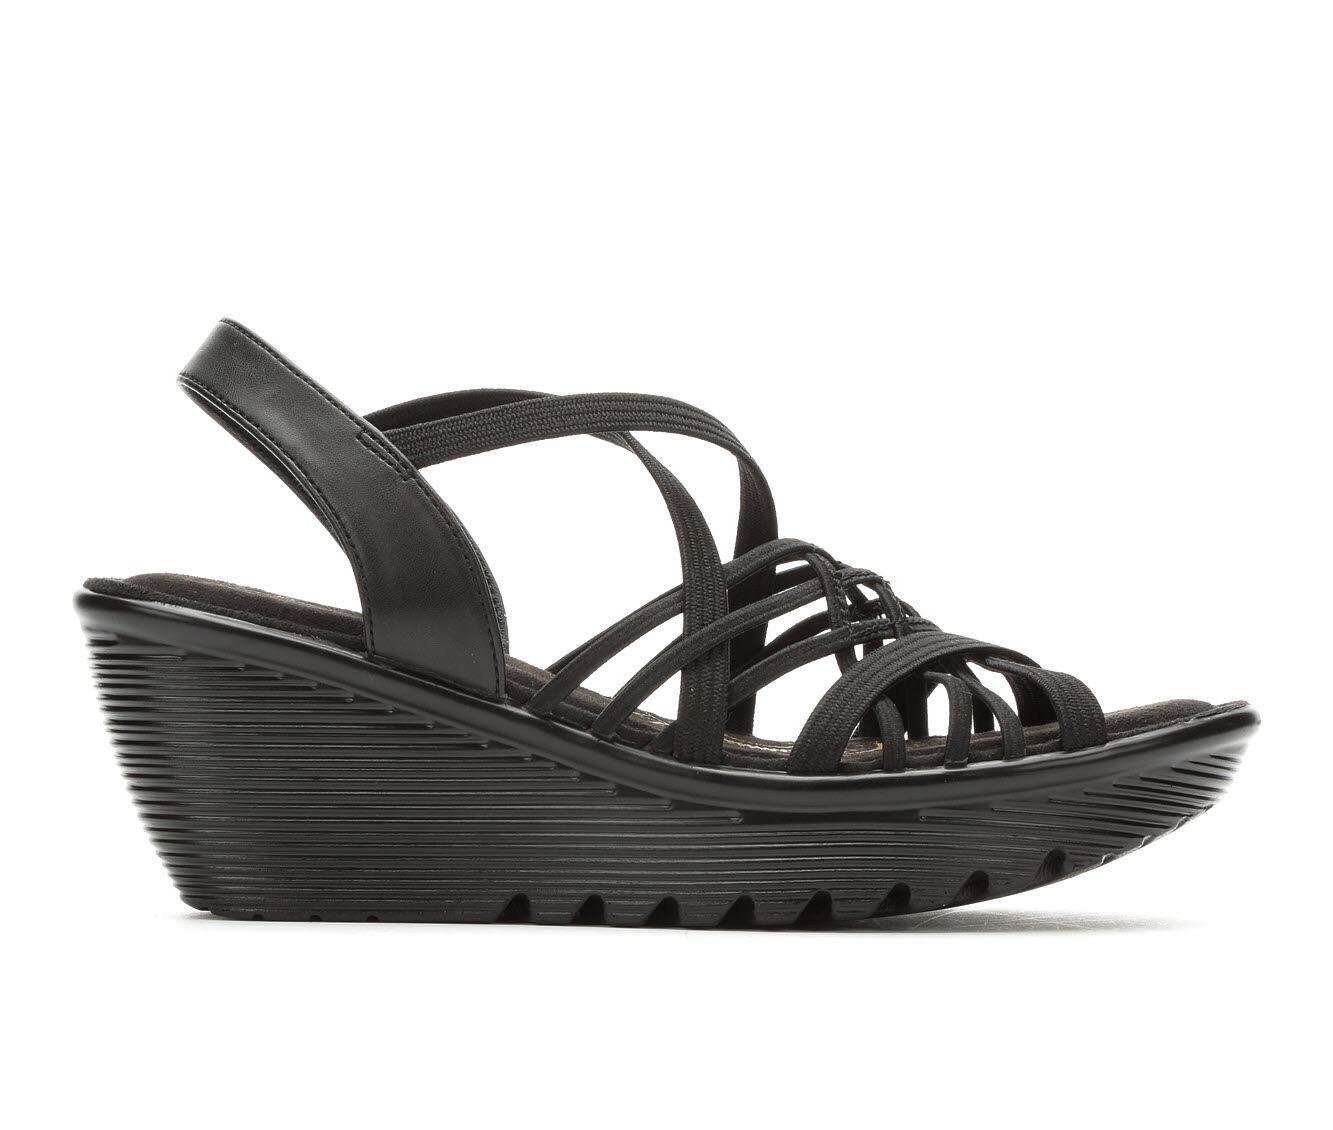 Women's Skechers Crossed Wires 41103 Strappy Wedge Sandals Black